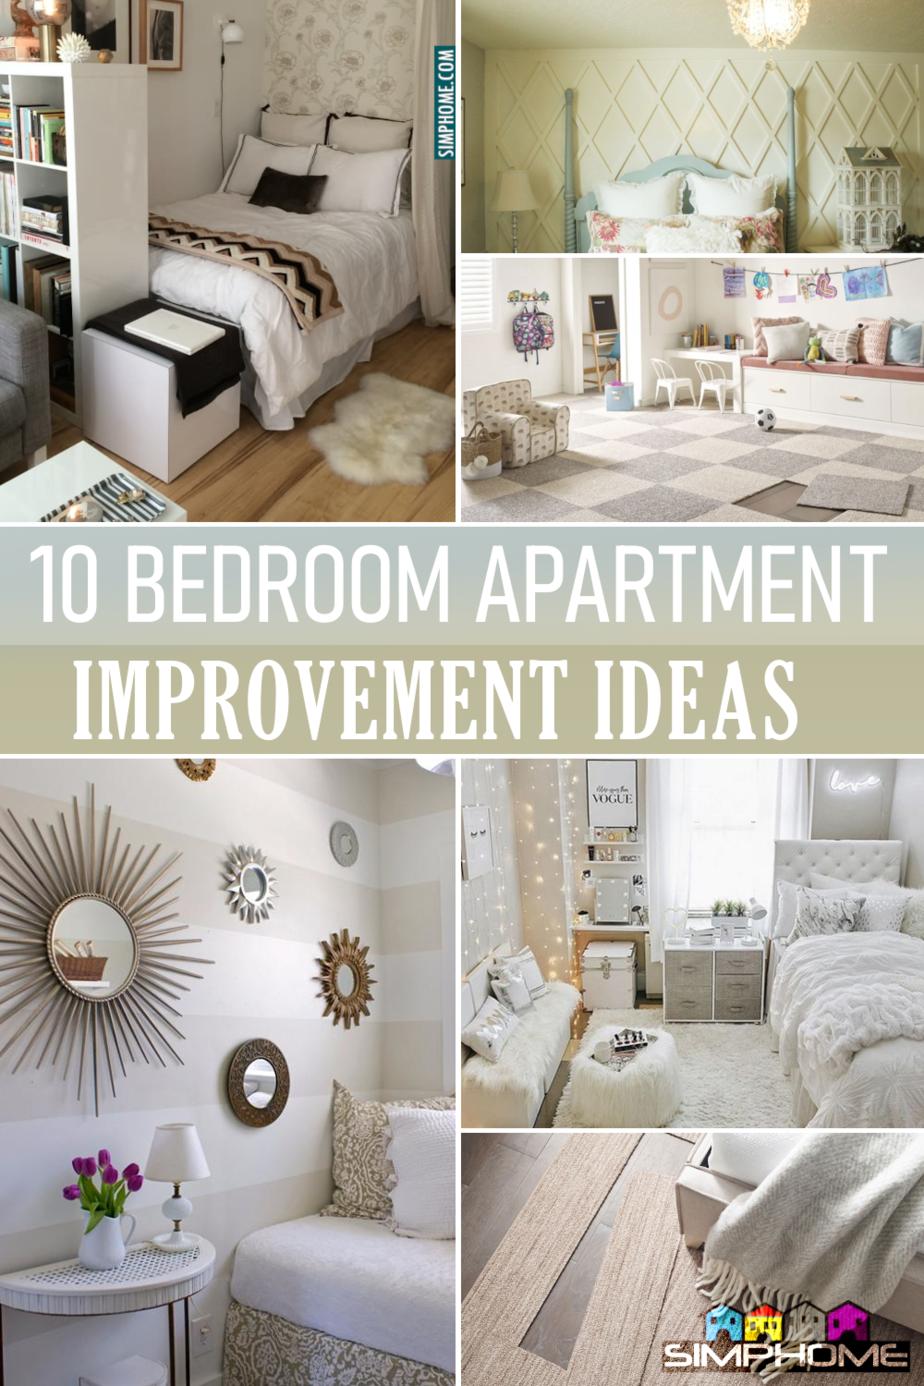 10 Bedroom Apartment Improvement Ideas Featured via Simphome.com